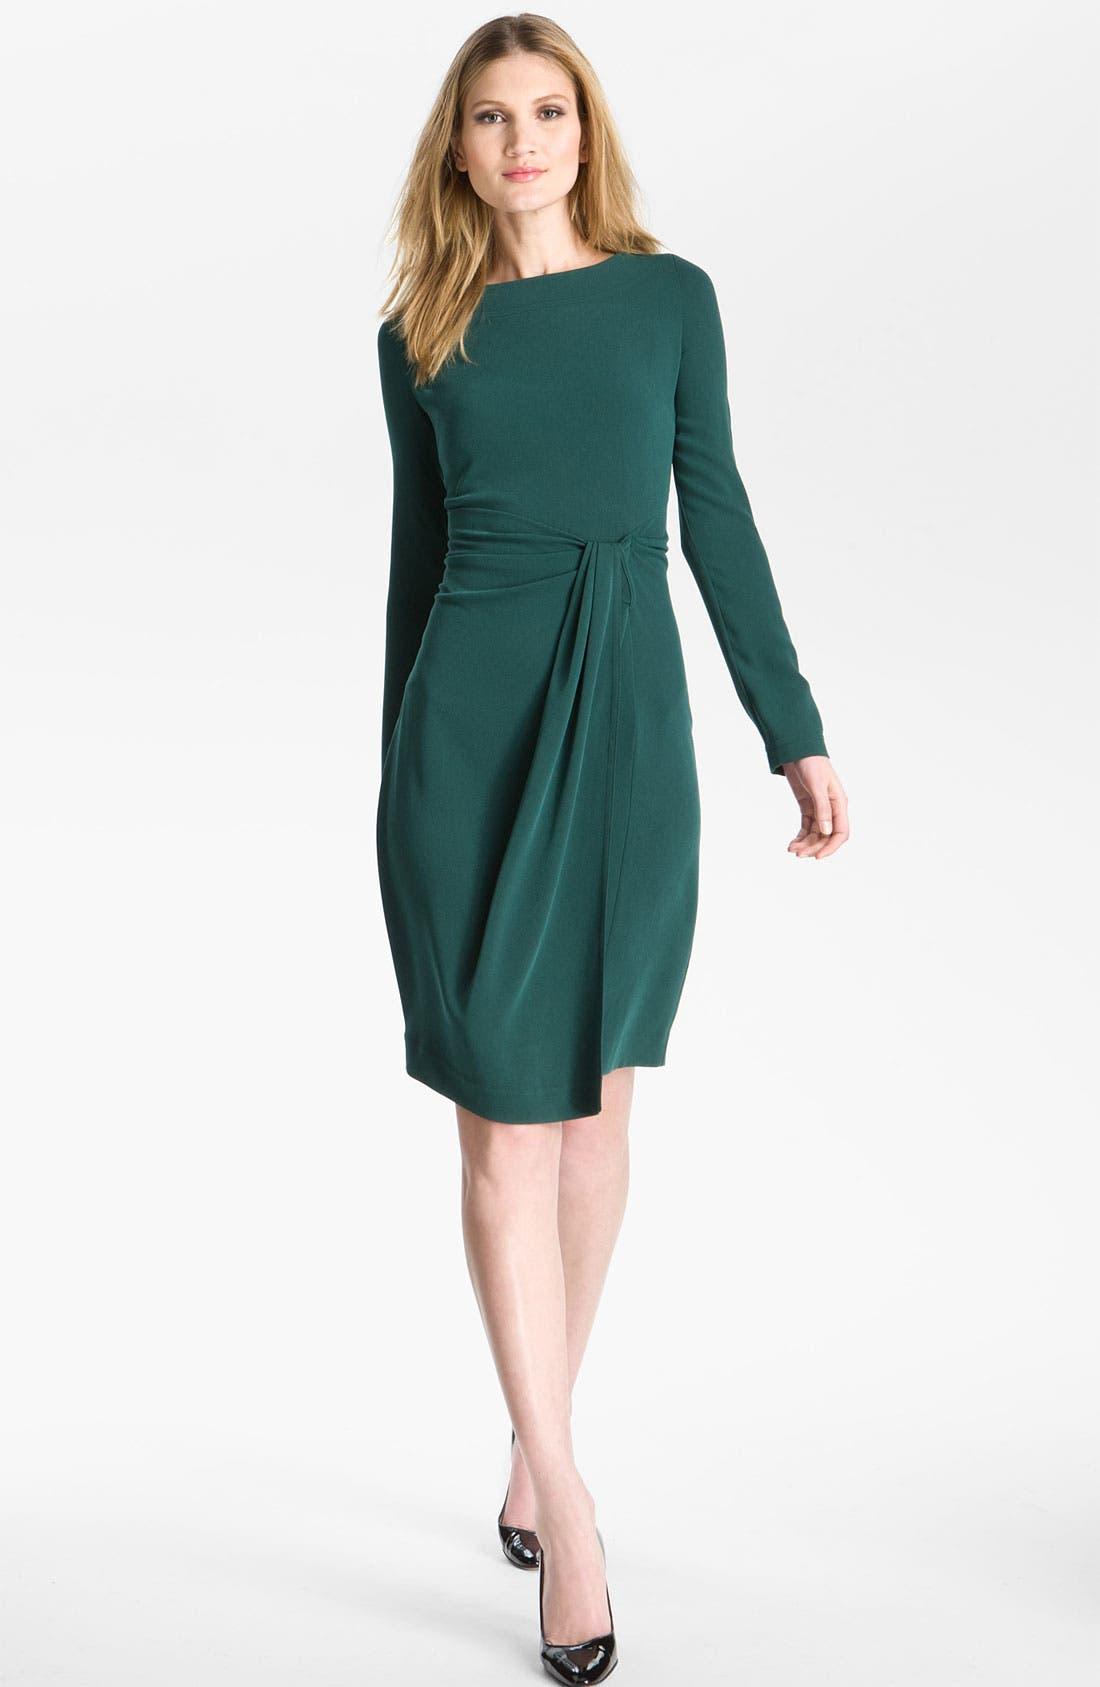 Main Image - St. John Collection 'Luxe Crepe' Faux Wrap Dress